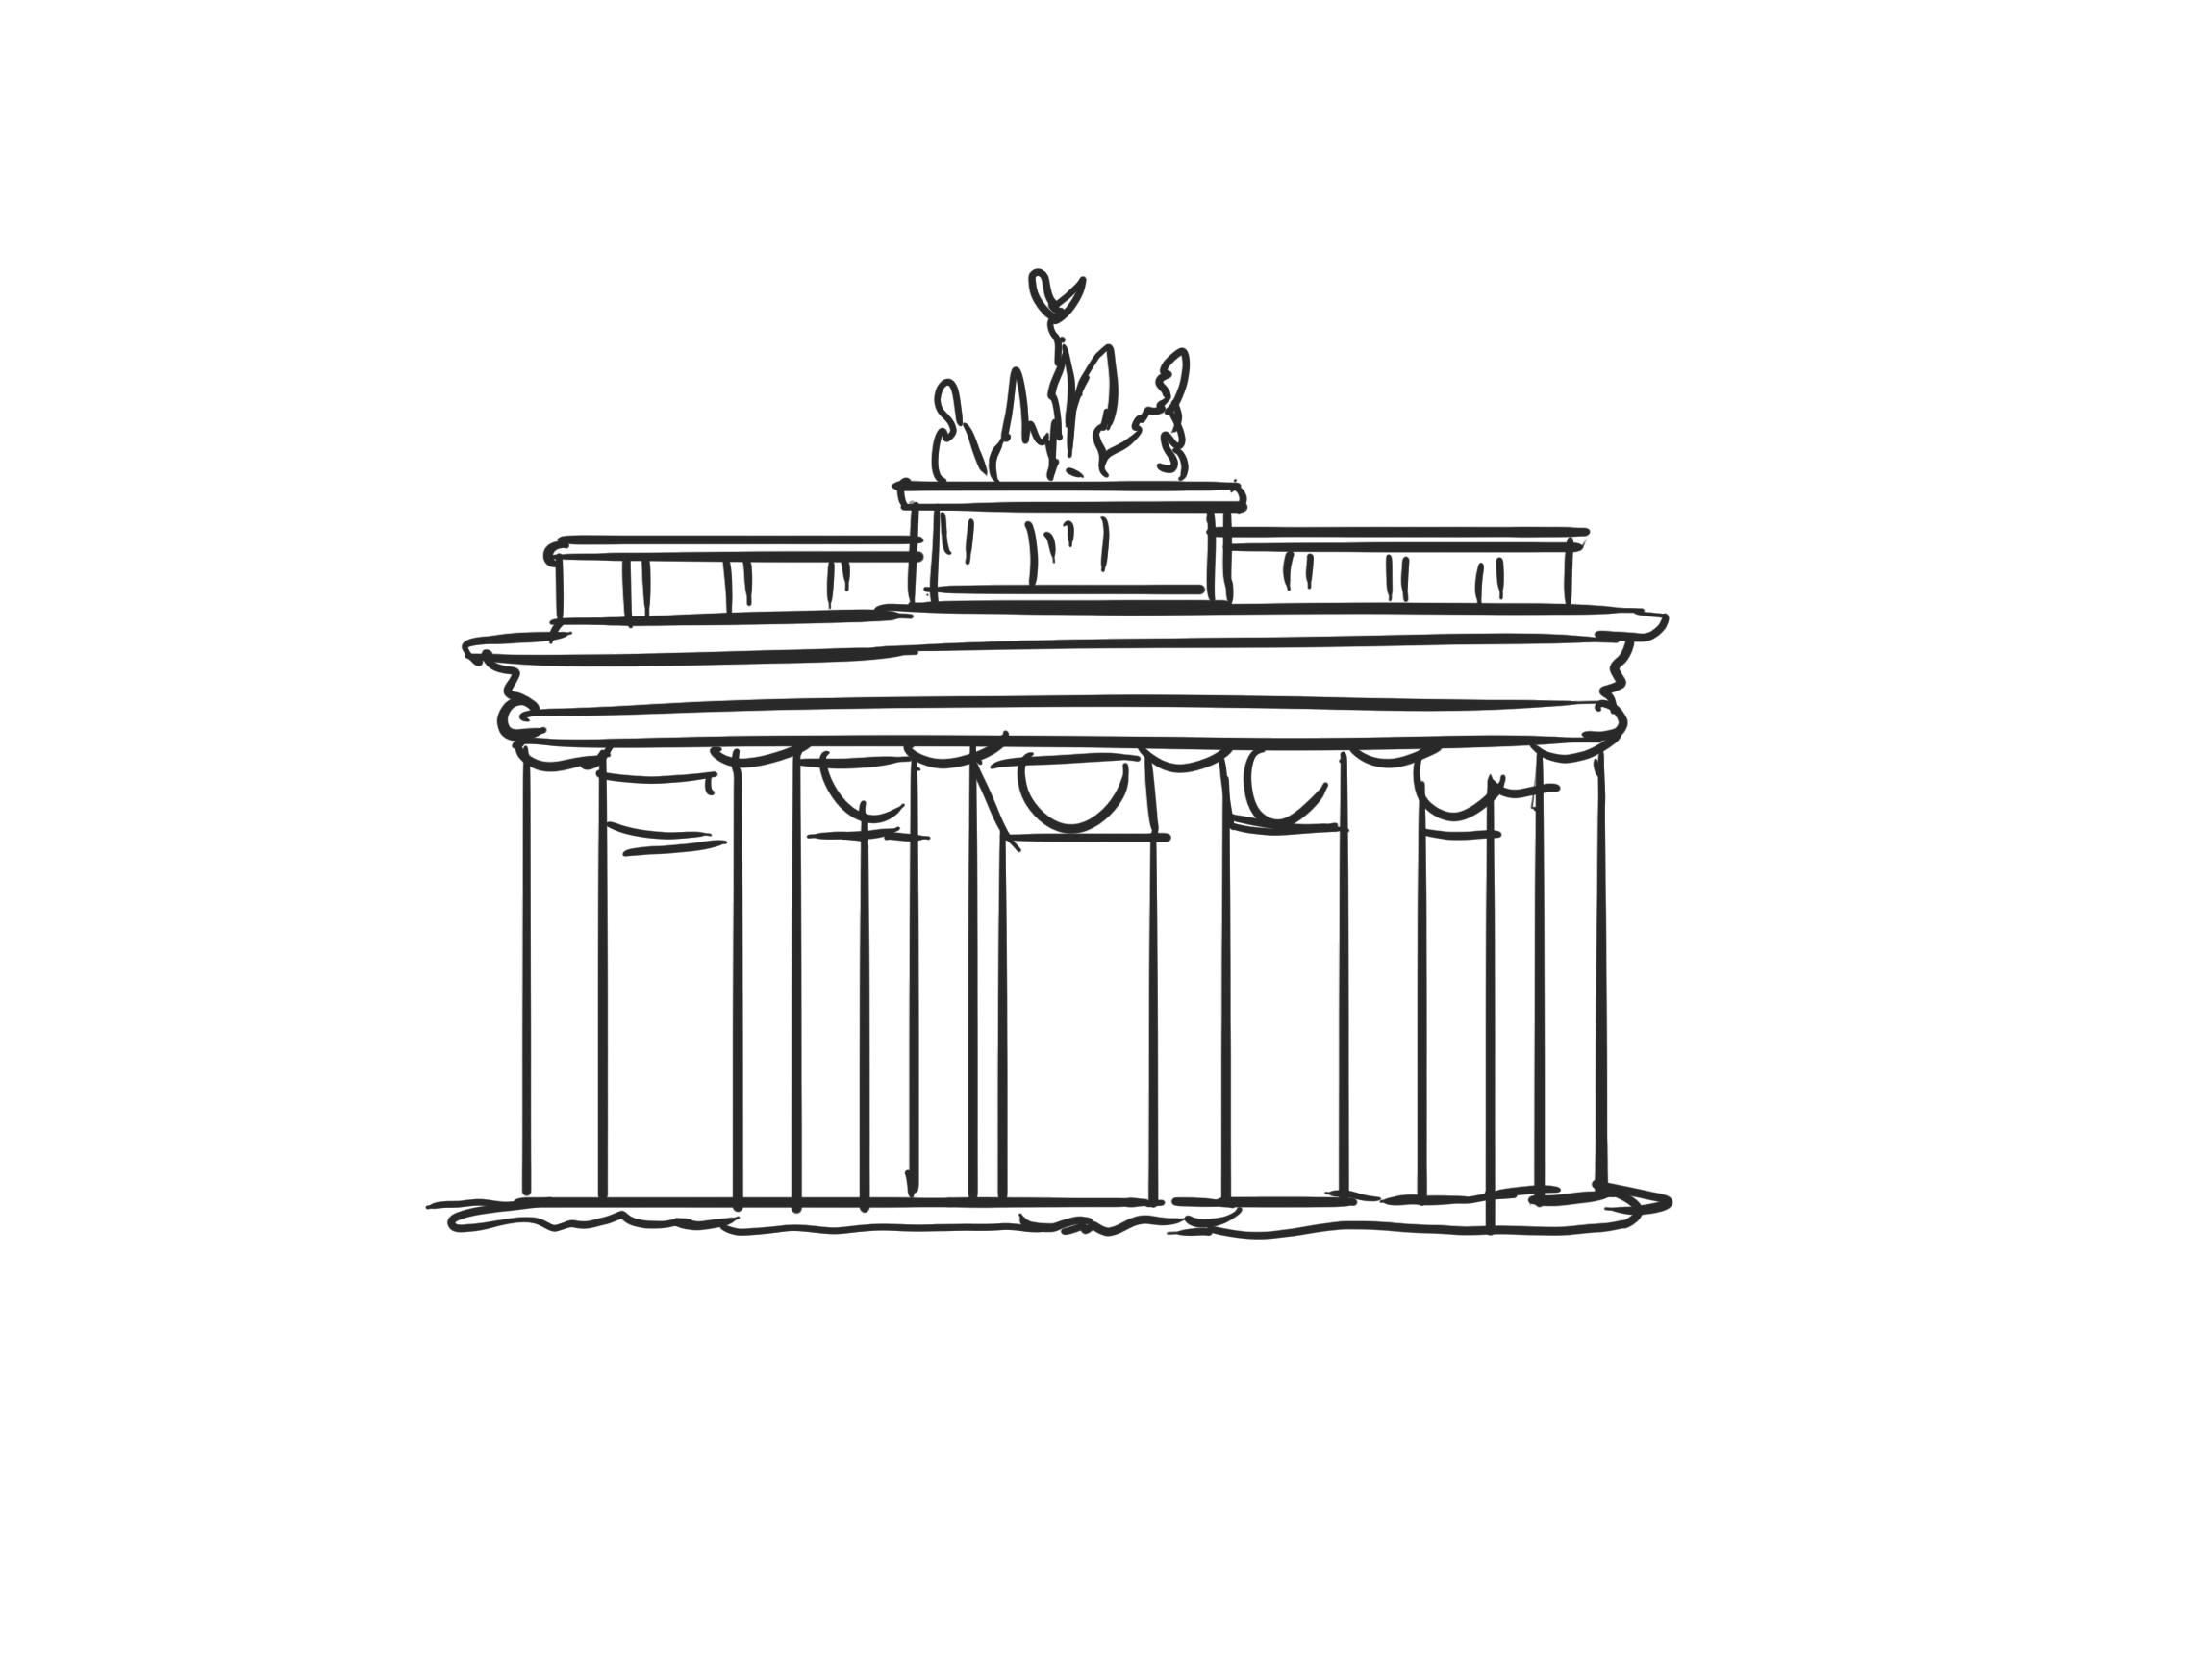 Porte de brandebourg dessins gratuits - Berlin clipart